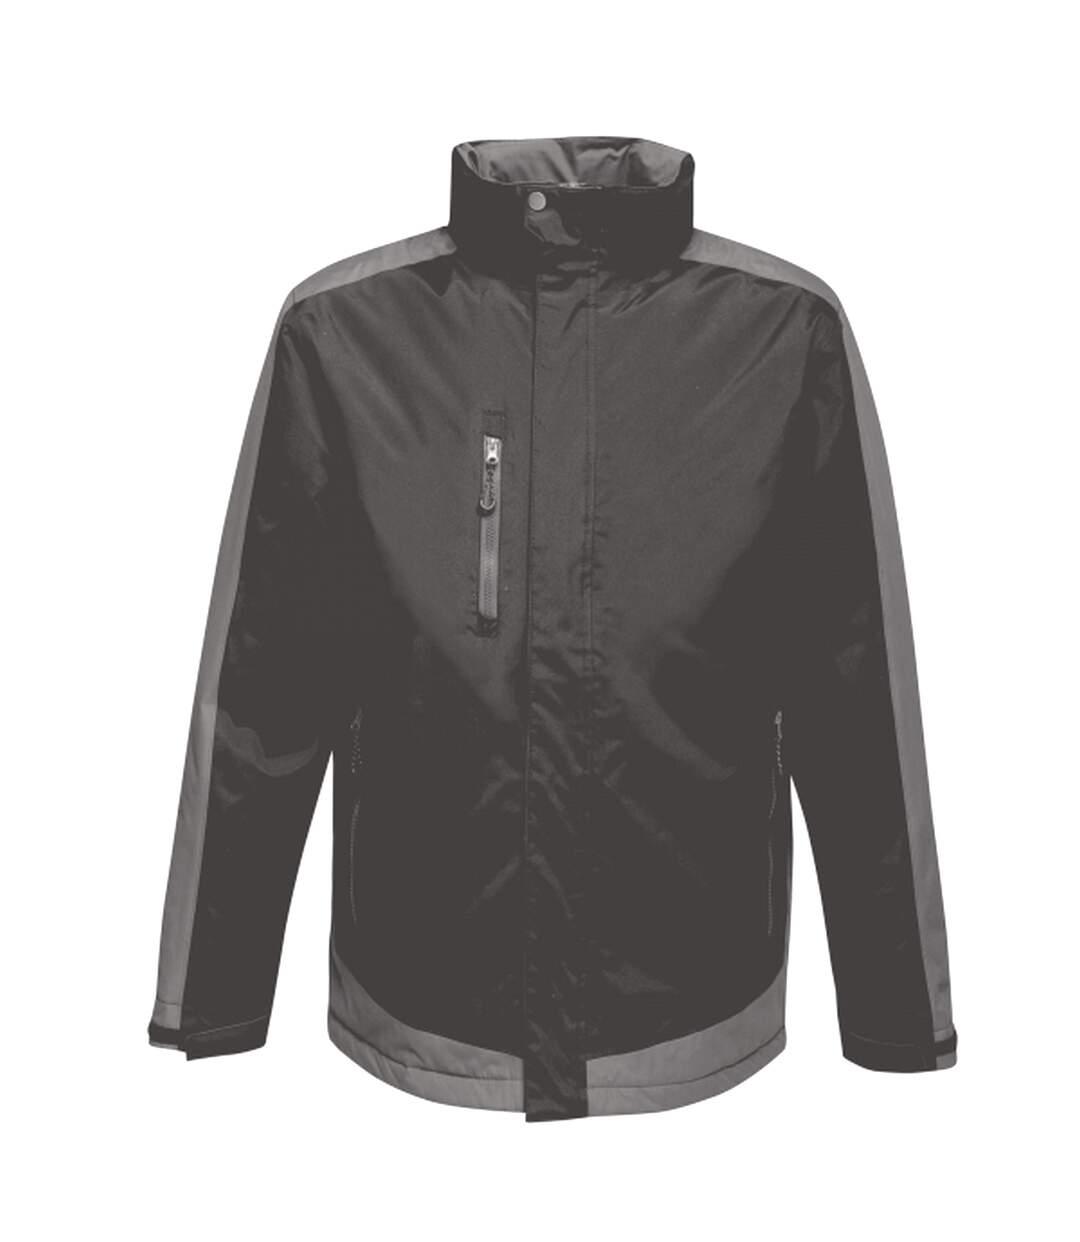 Regatta Mens Contrast Full Zip Jacket (Raspberry Red/Graphite Black) - UTRG3743